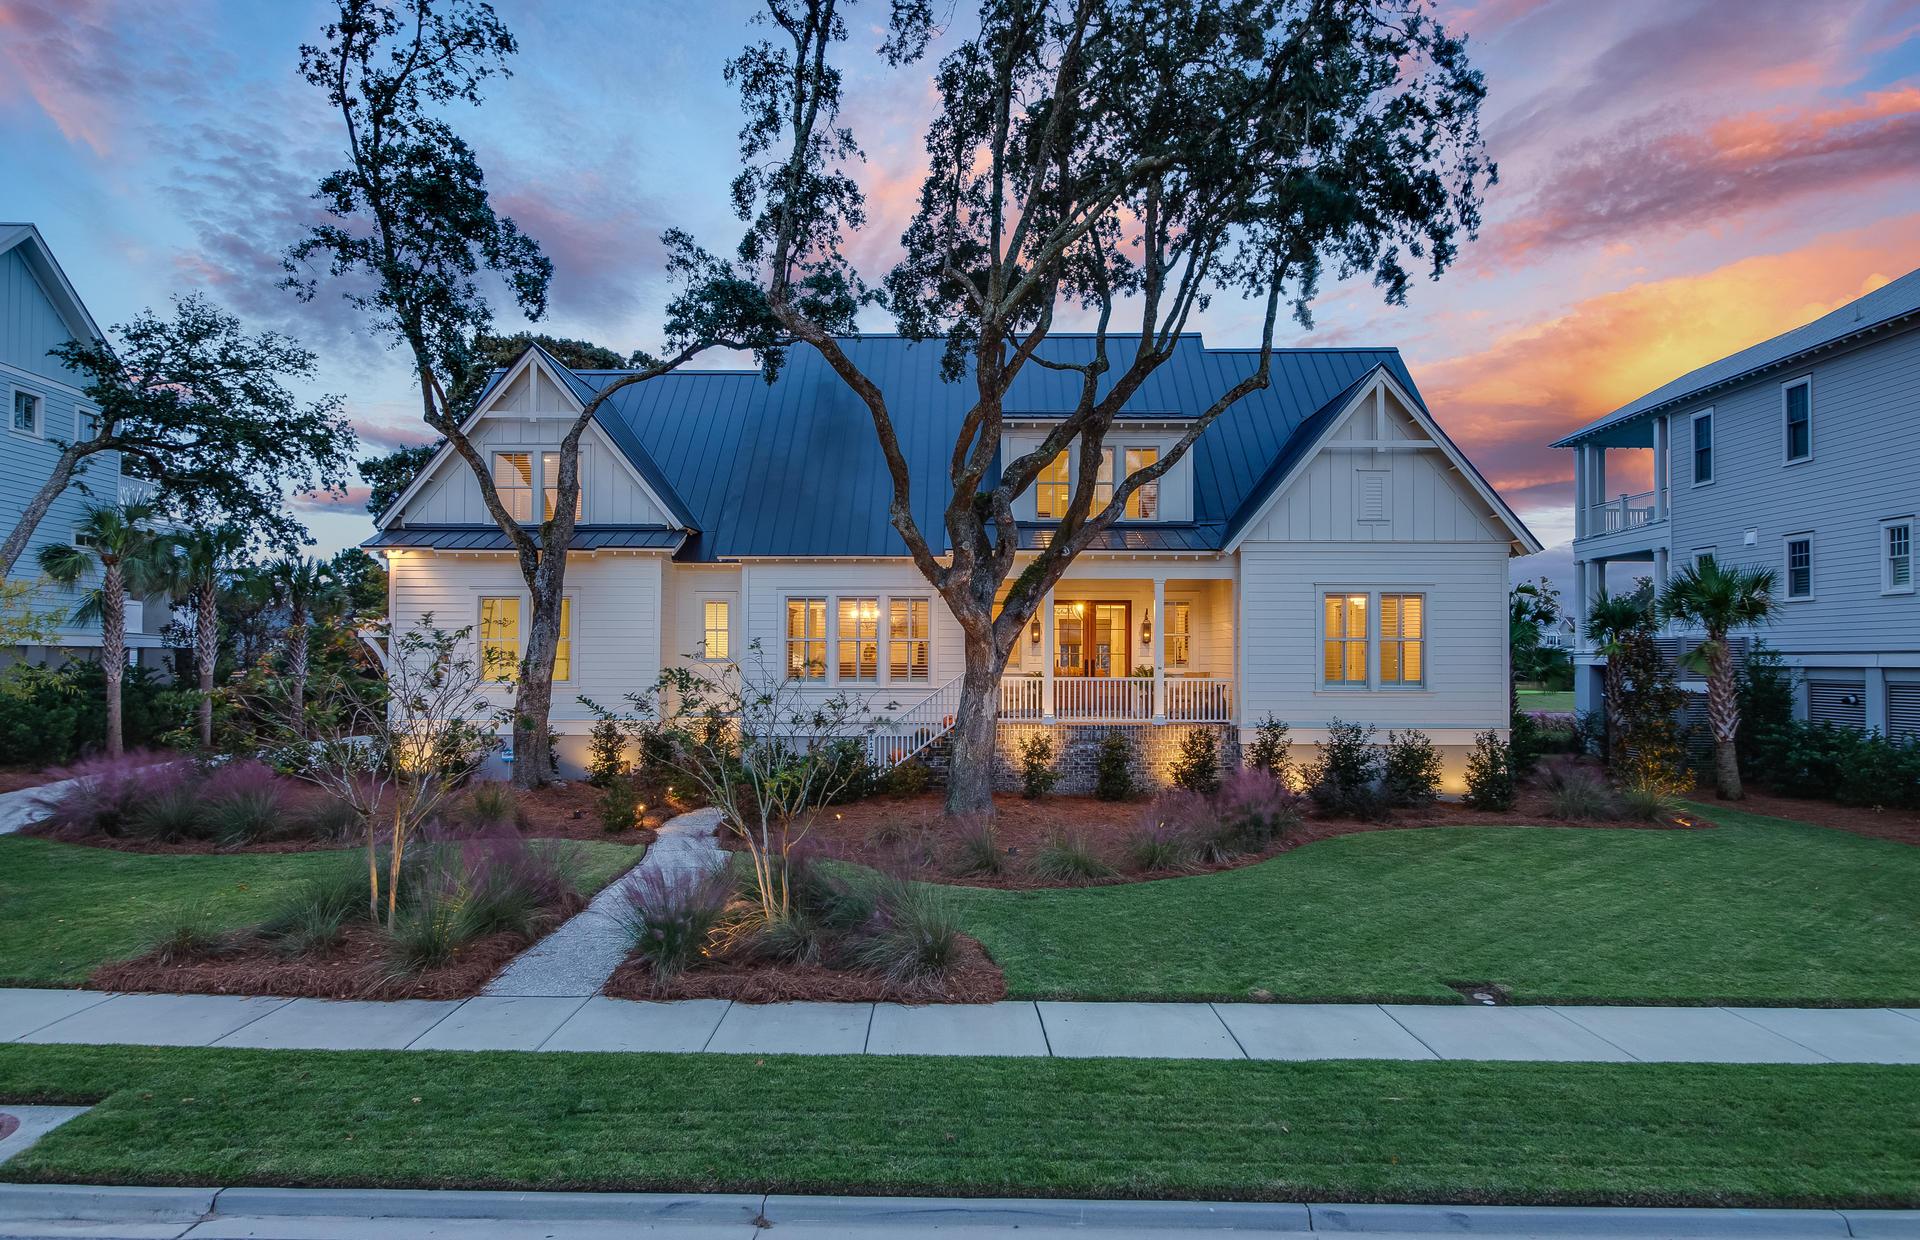 Daniel Island Park Homes For Sale - 117 Brailsford, Charleston, SC - 93